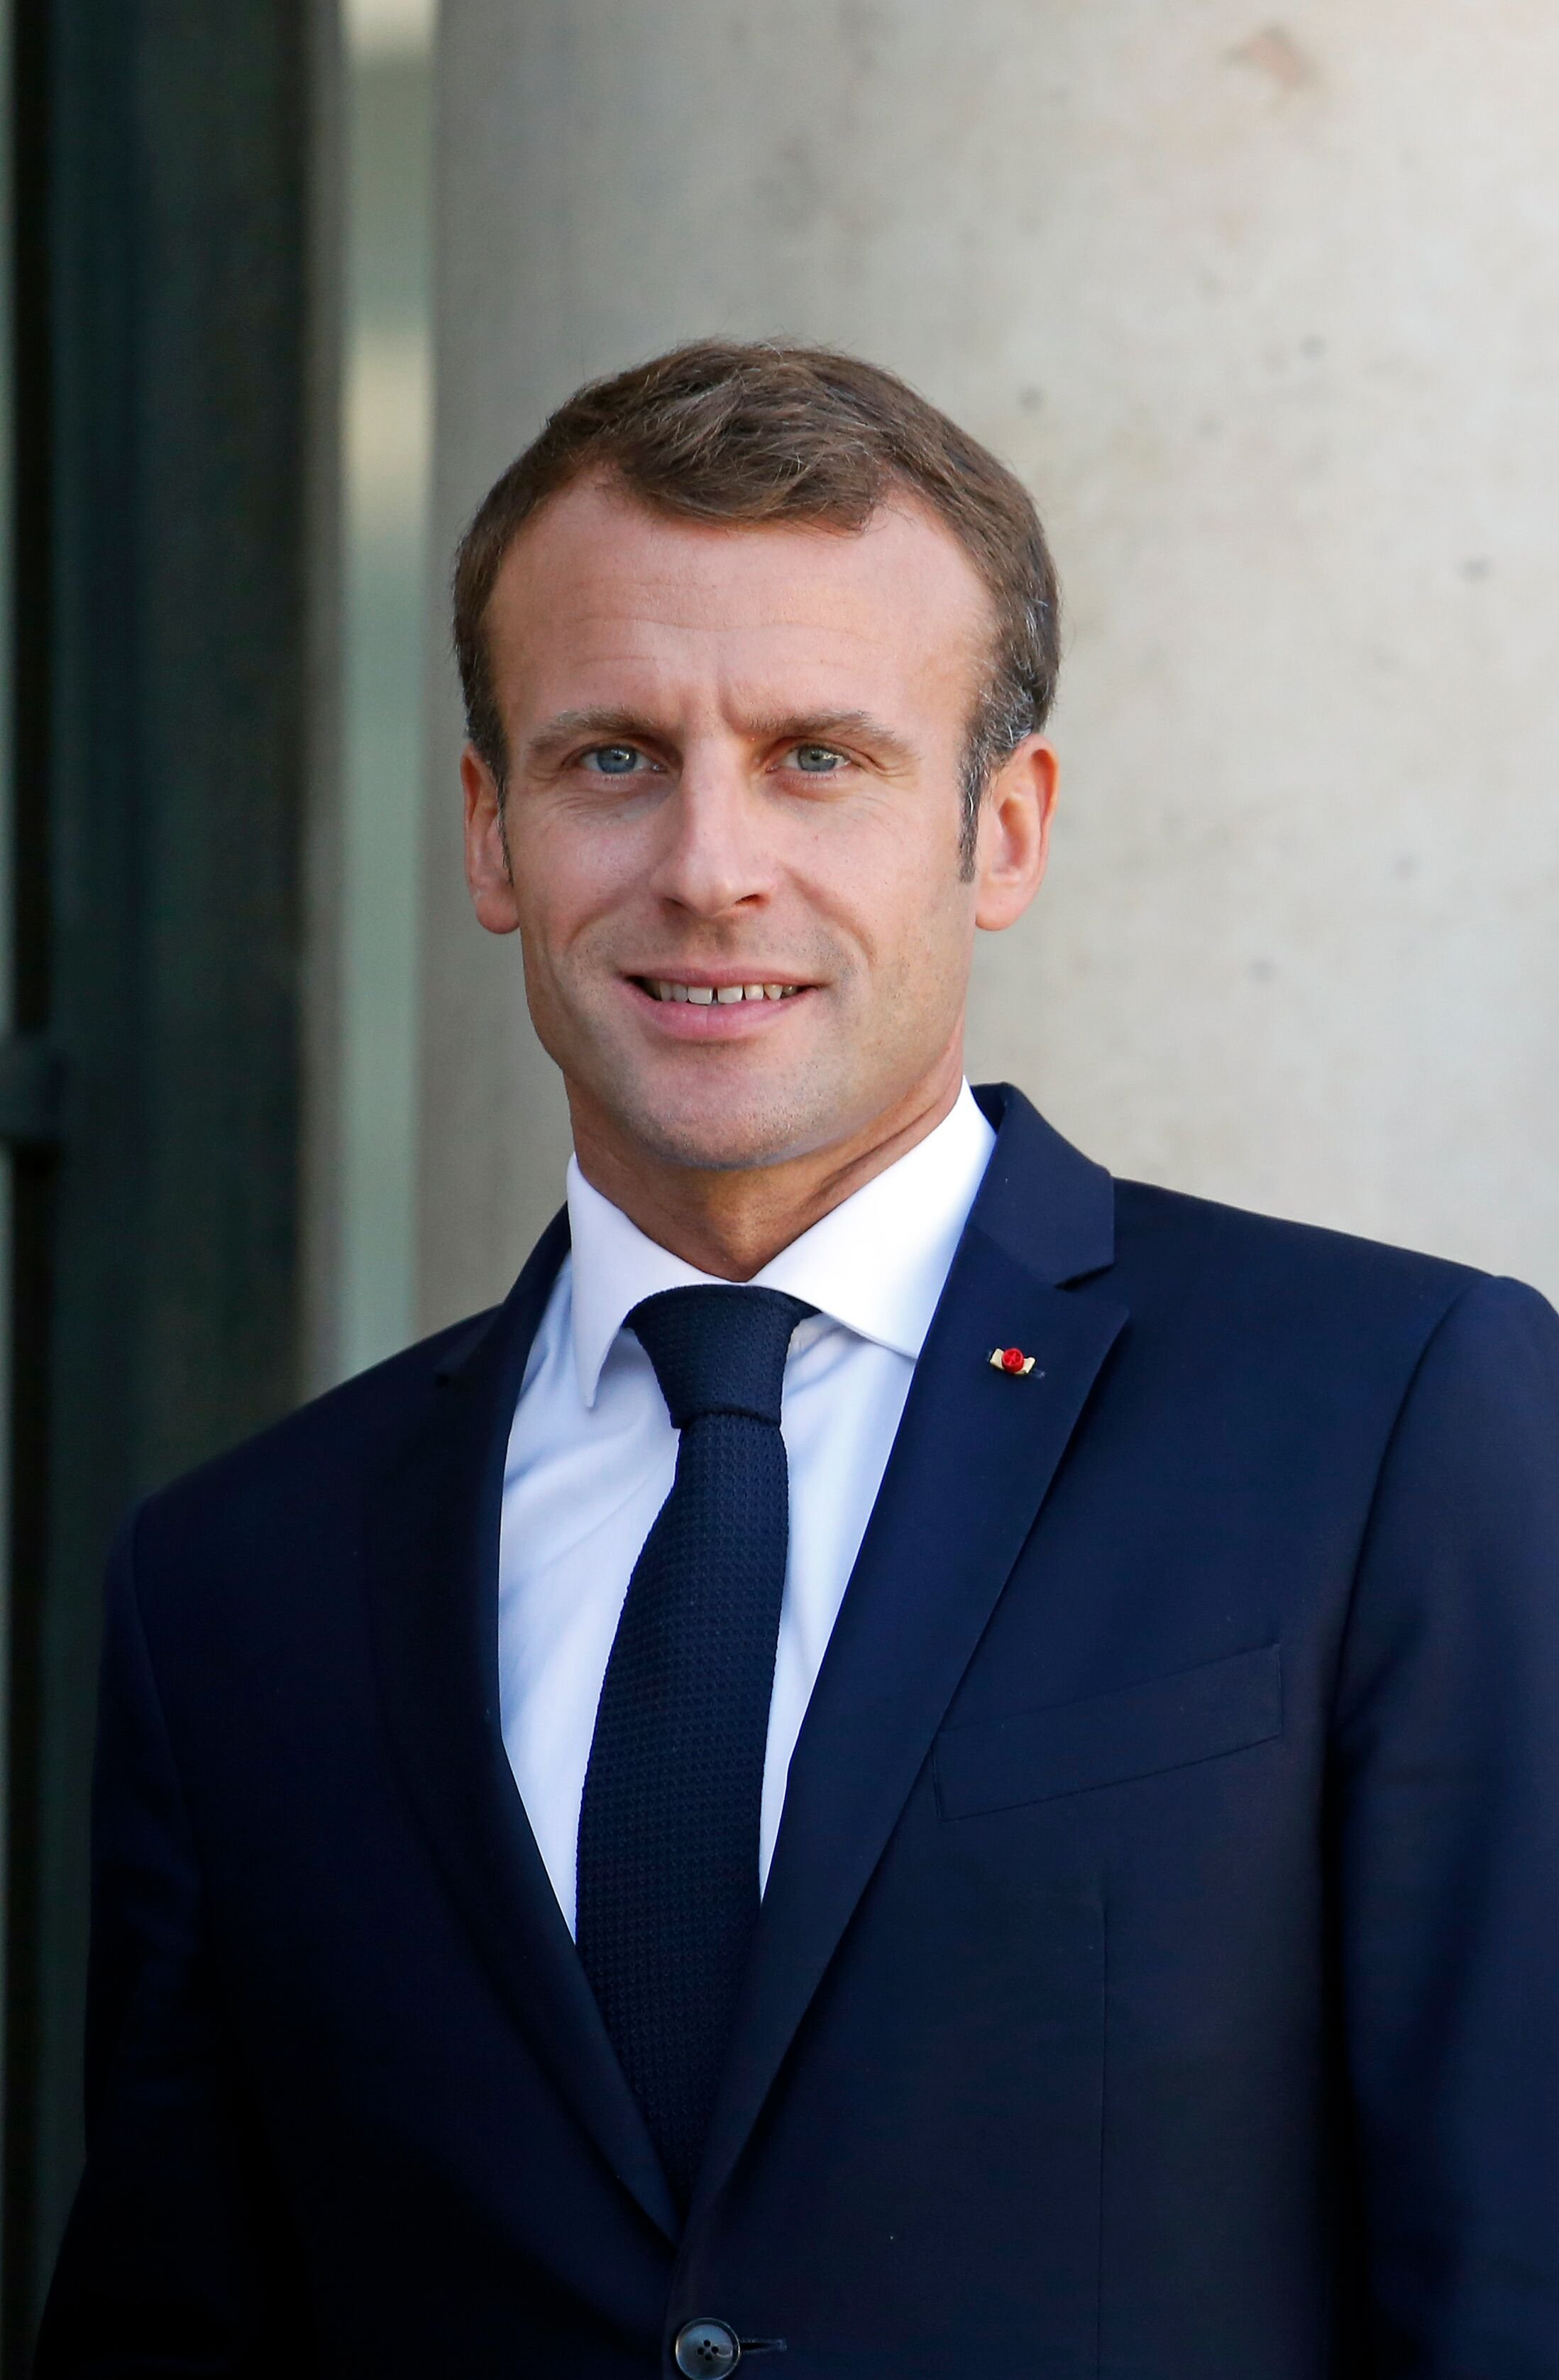 Emmanuel Macron qui sourit.   Photo : GettyImage